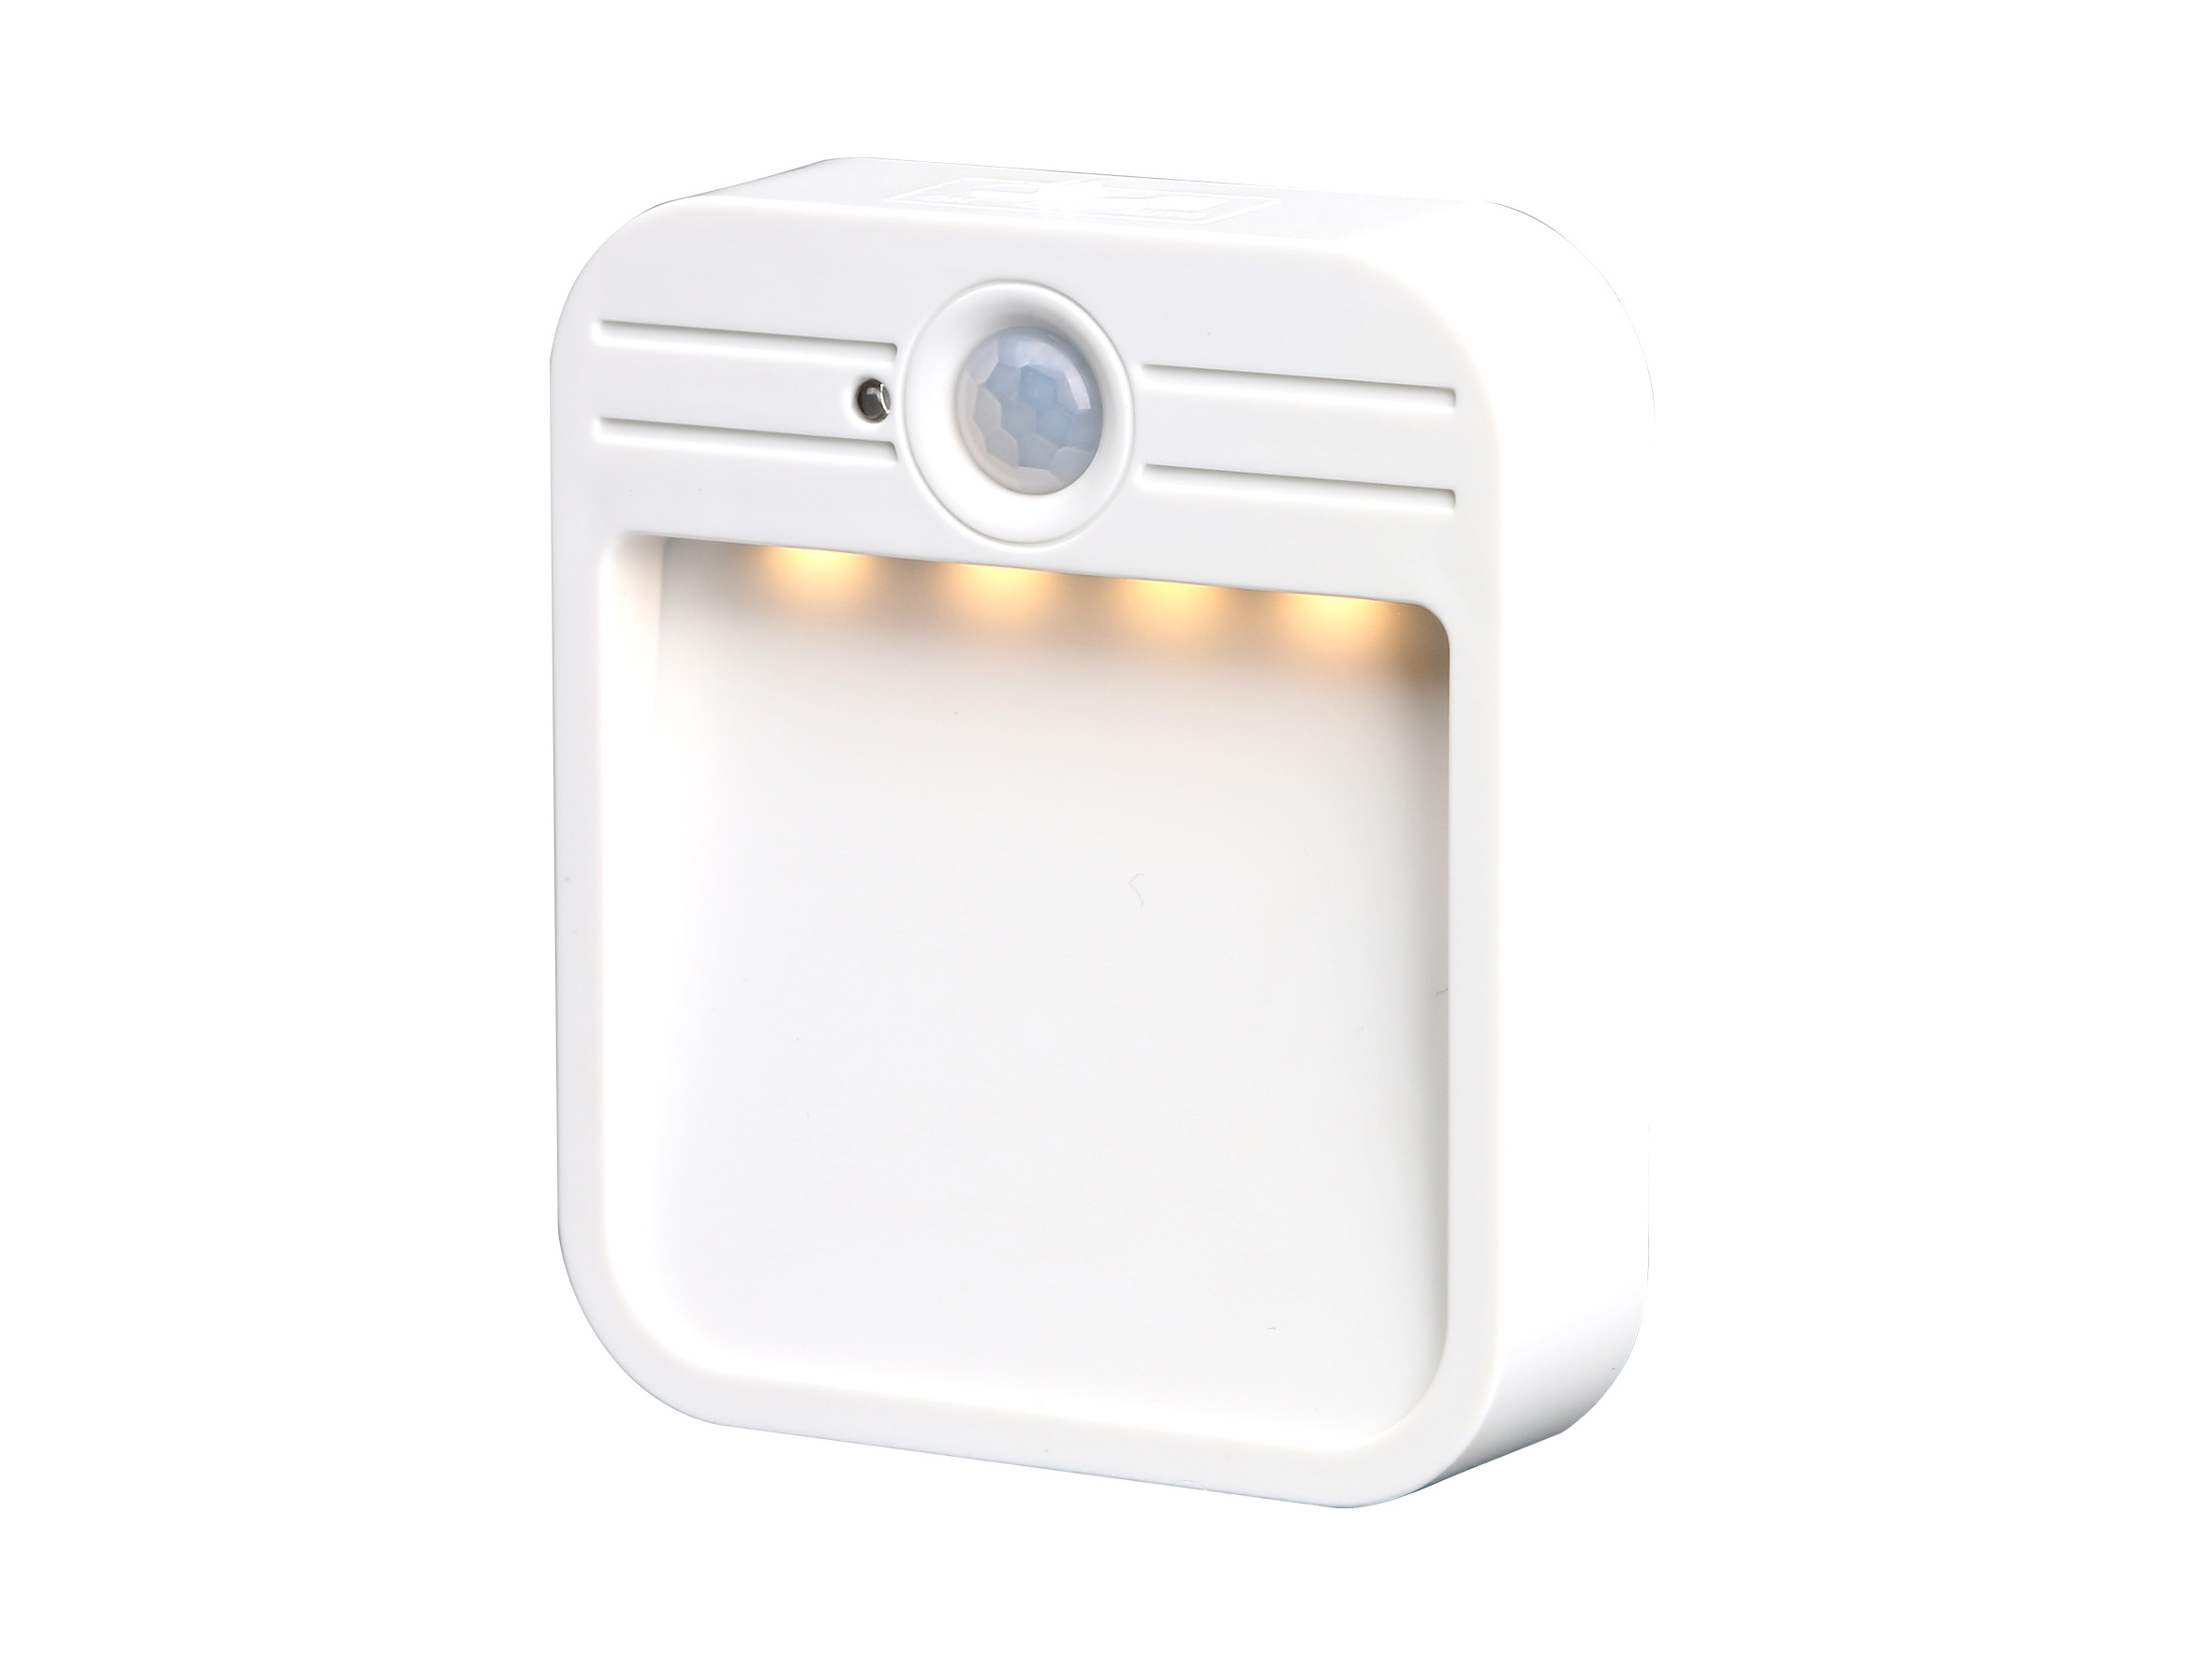 Auto Sensing LED Night Light